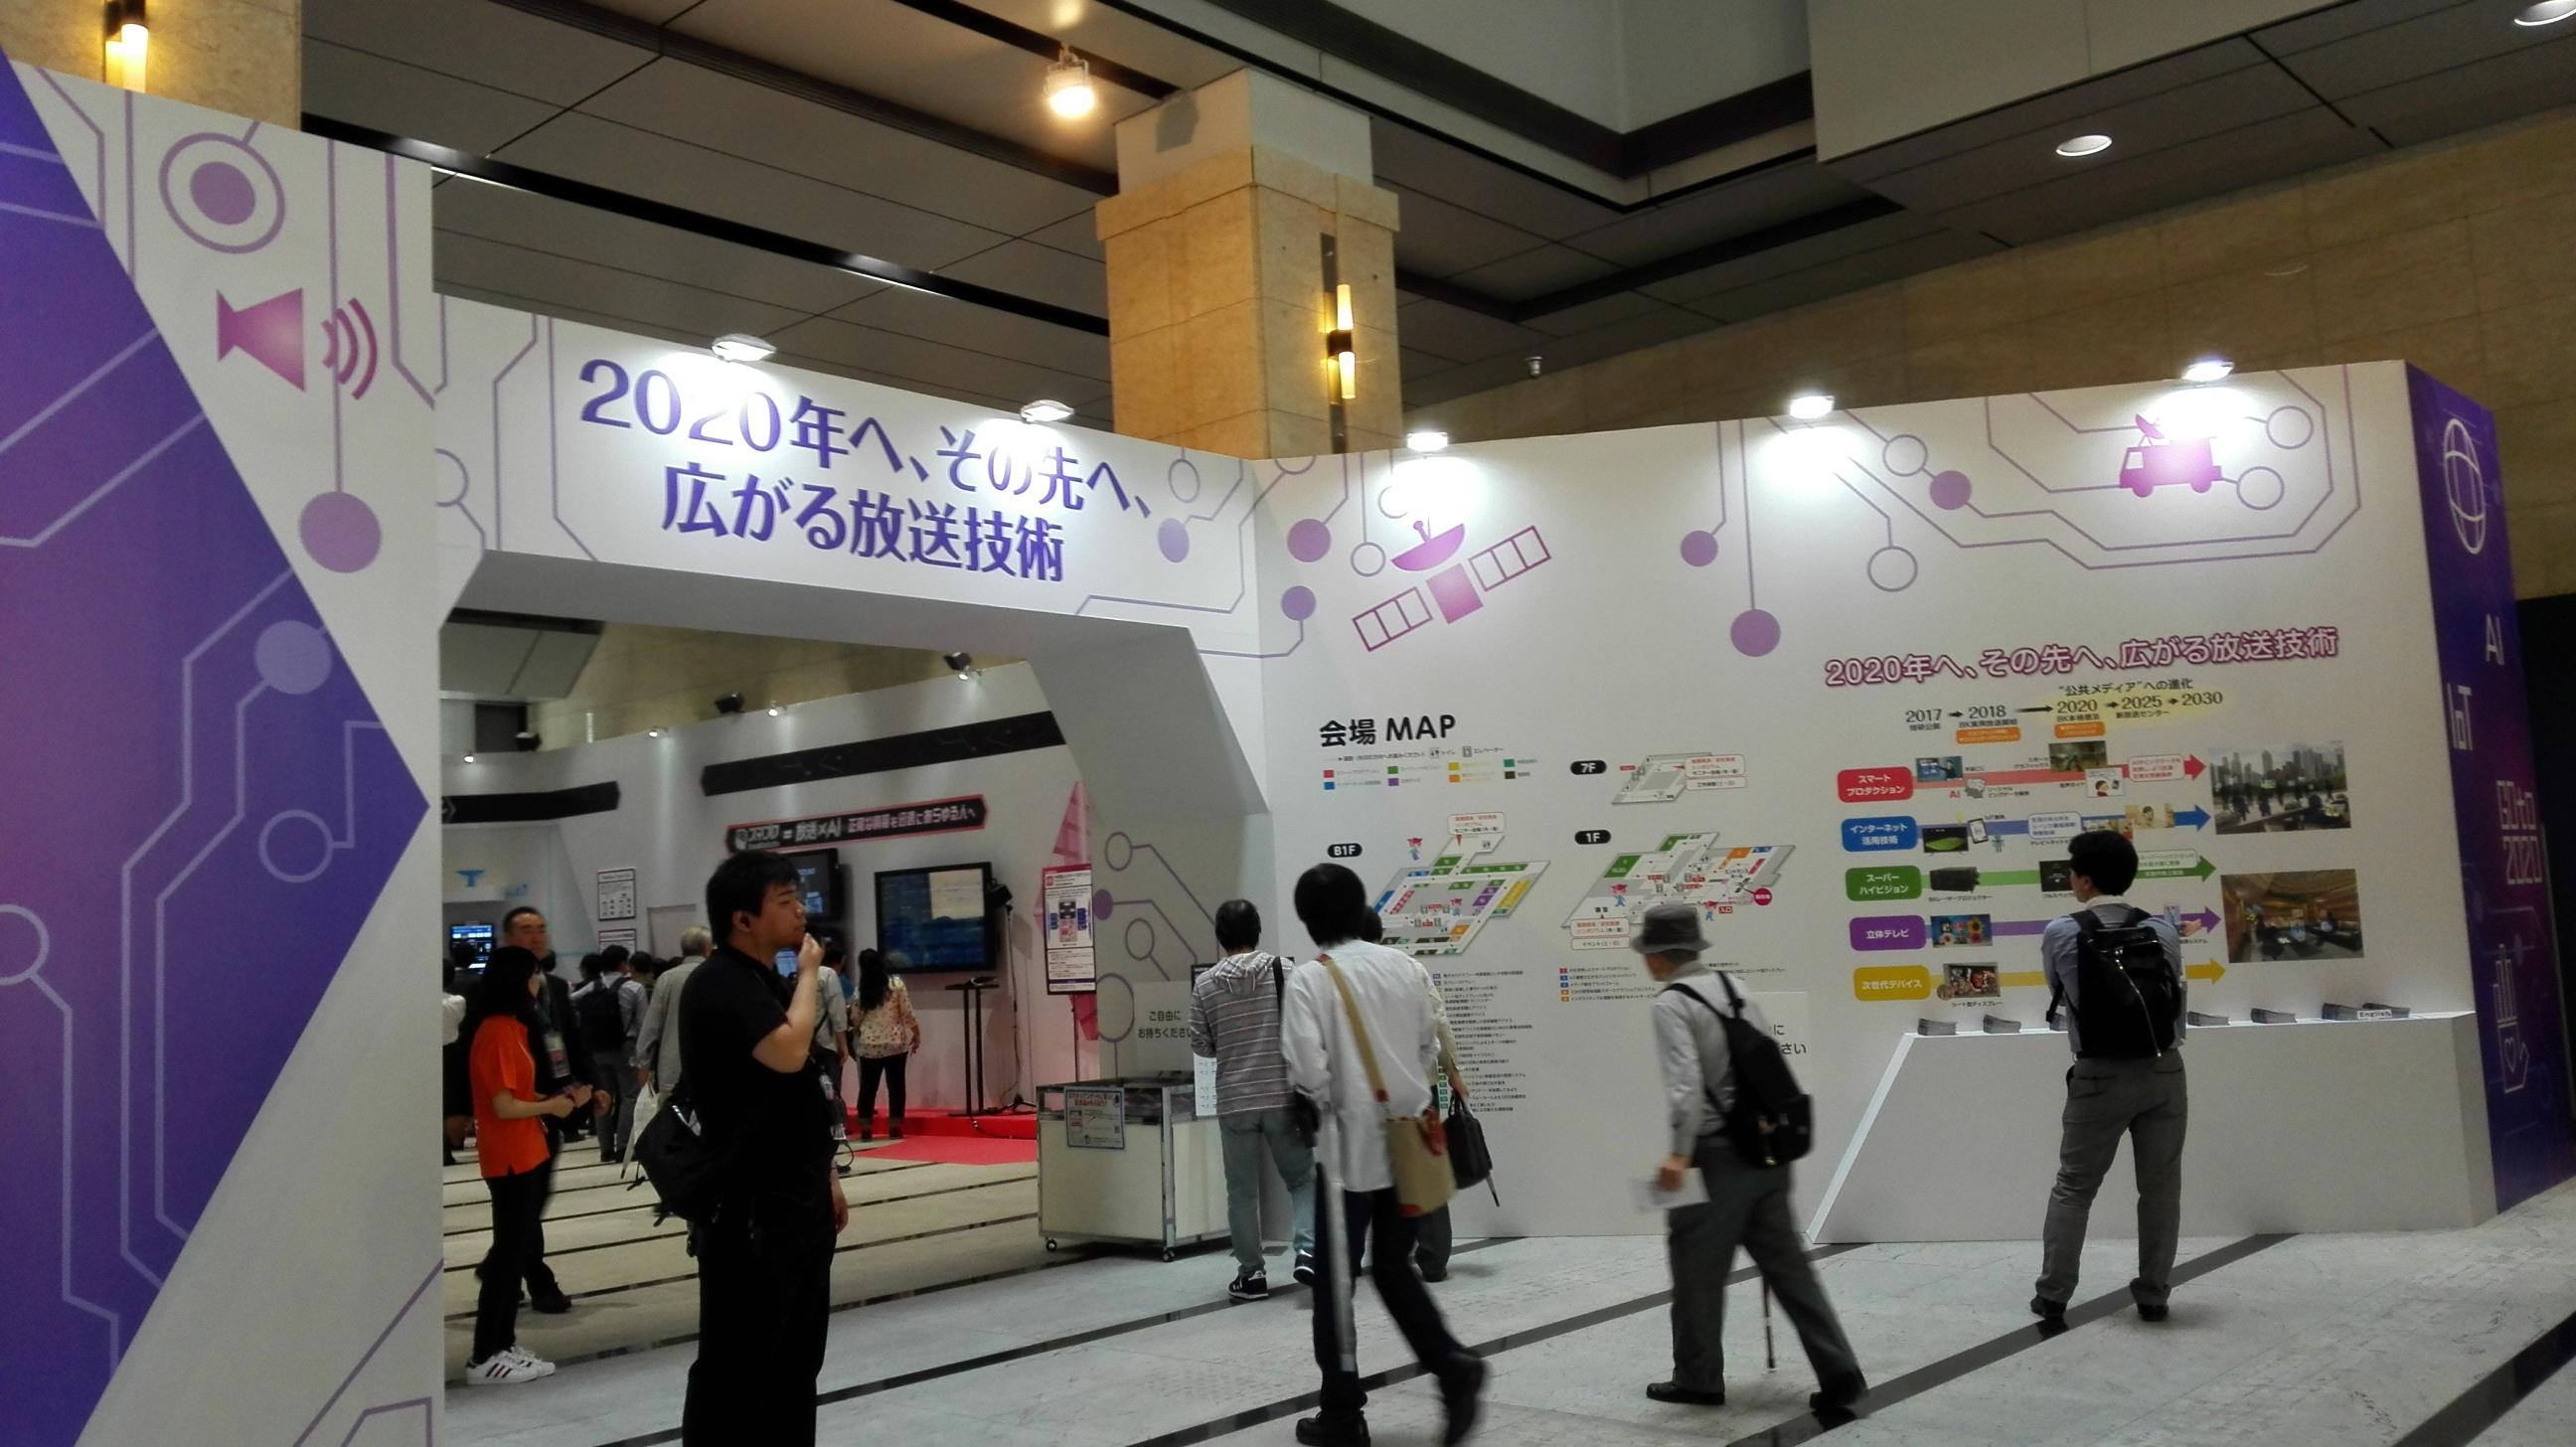 NHK技研公開2017基調講演から考える、「2020年その先のテレビ」〜関根禎嘉連載・メディアイベント右往左往《第5回》〜